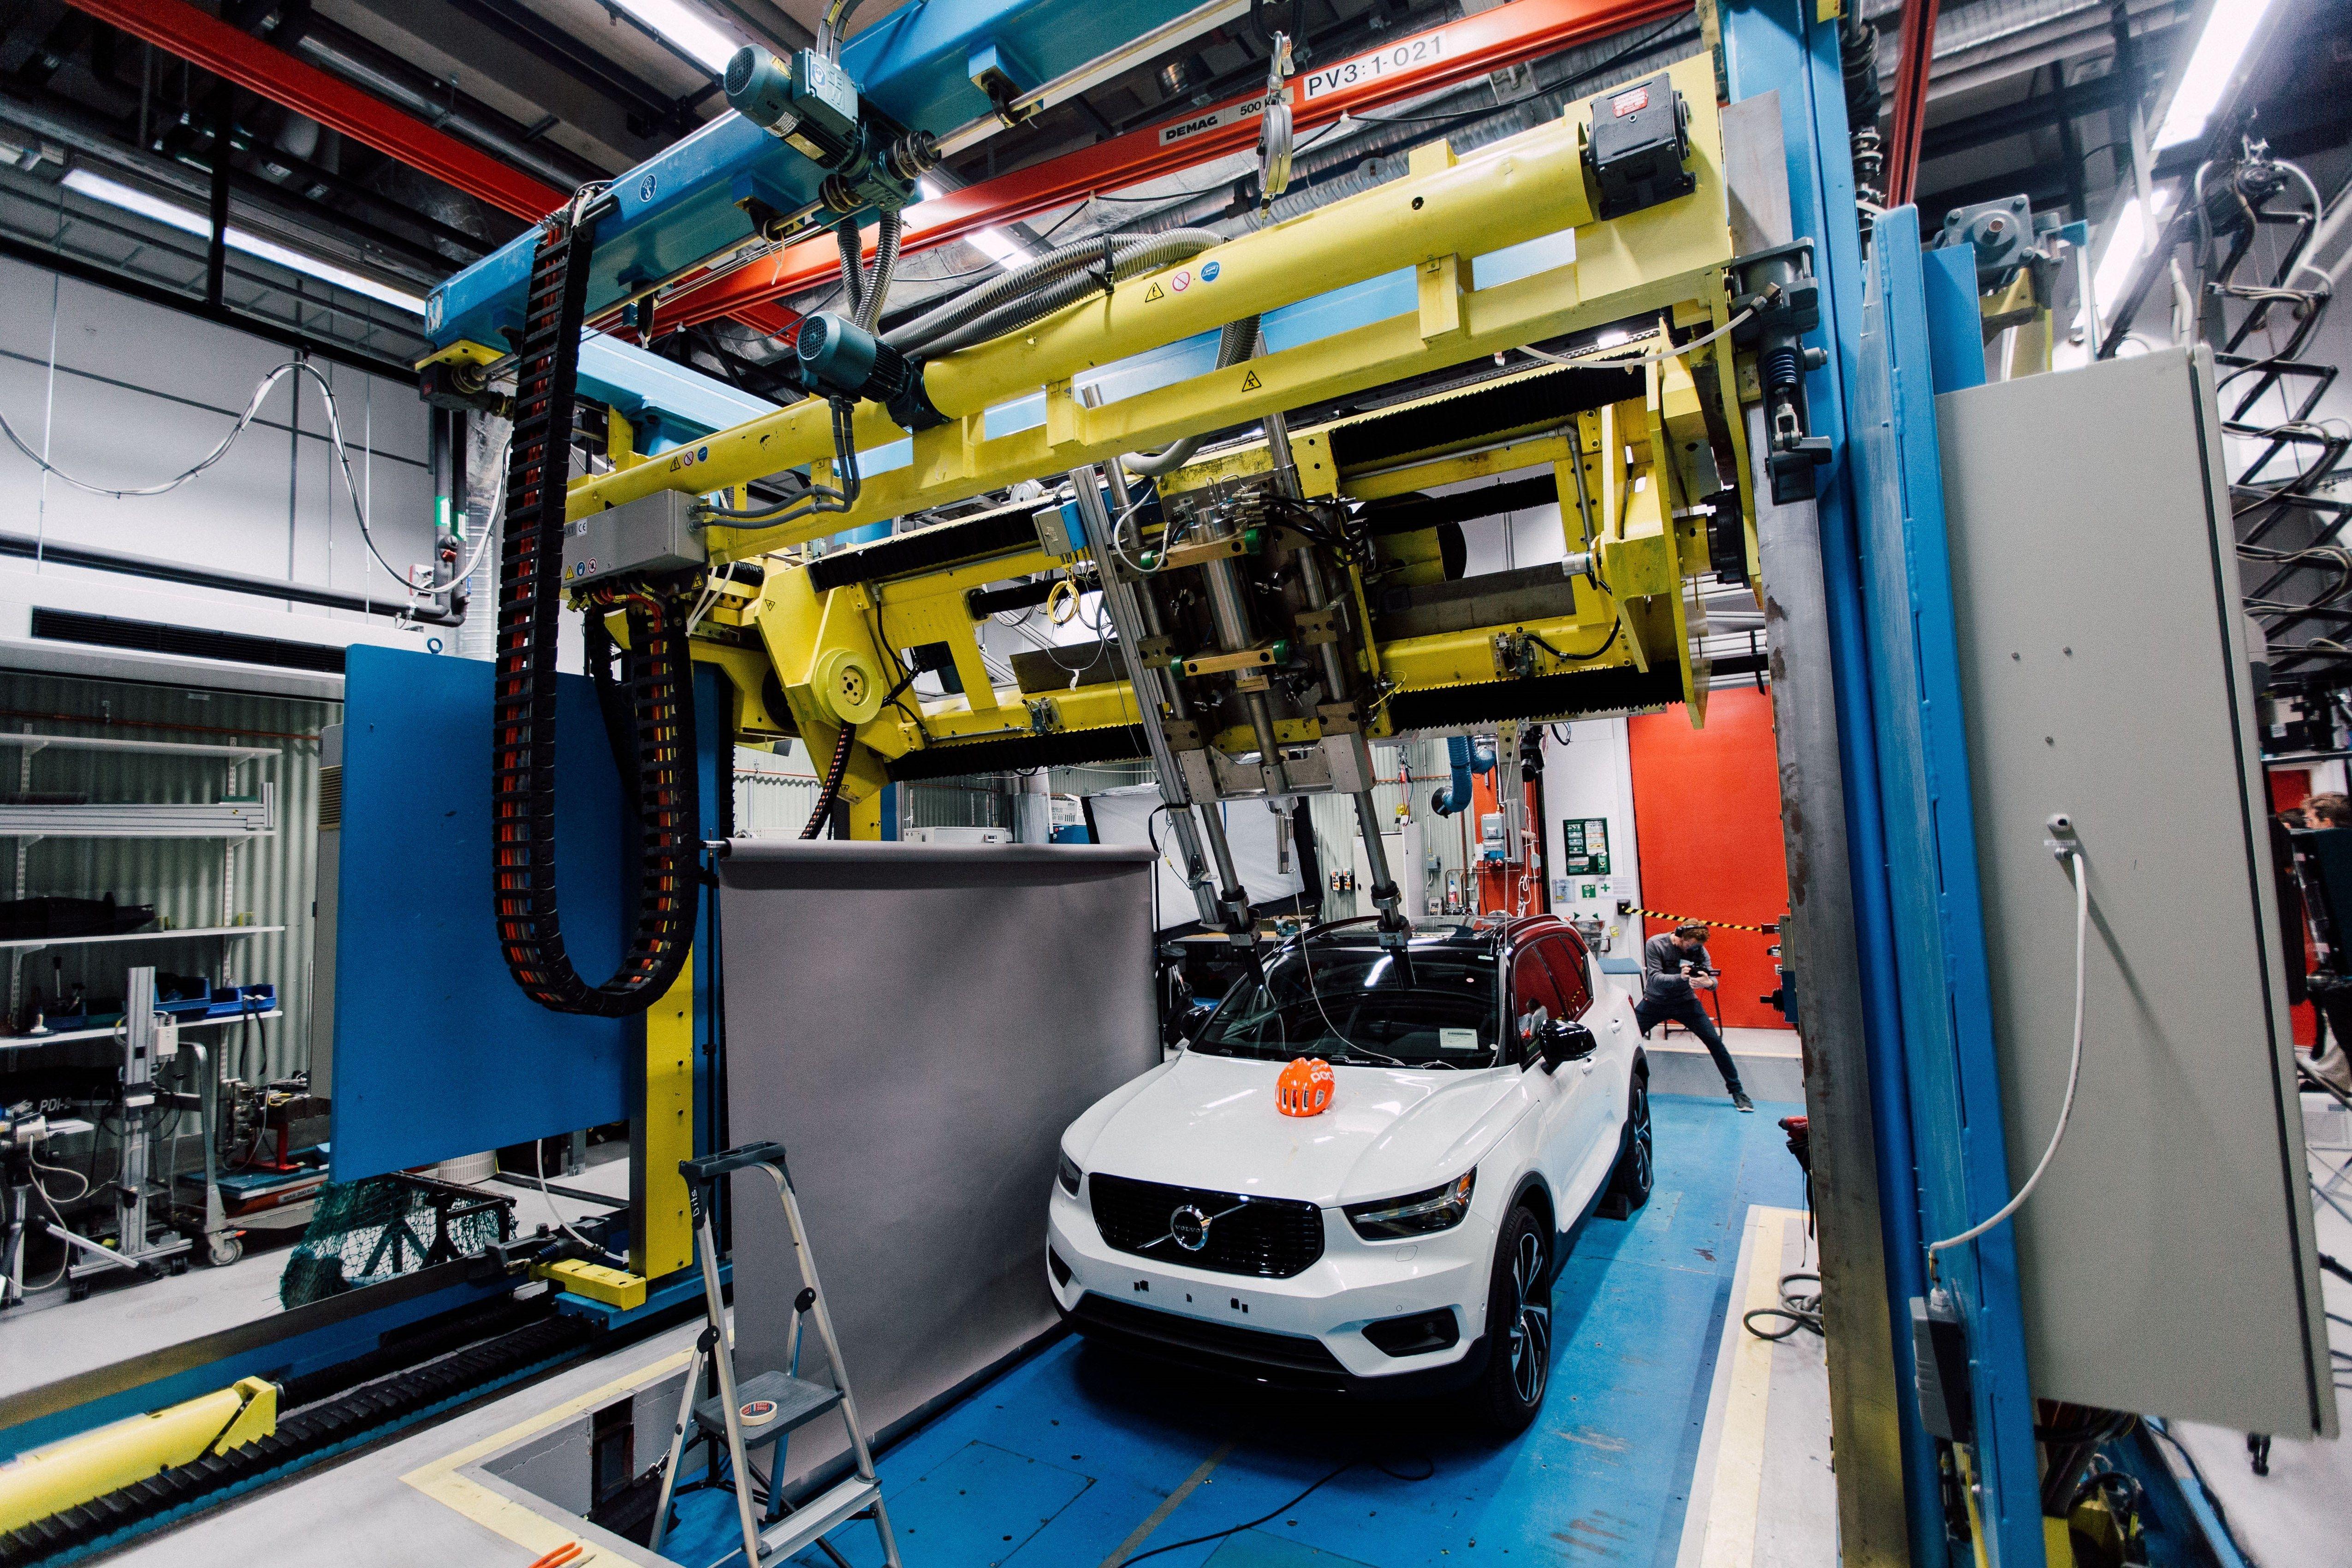 Car in building crash tests